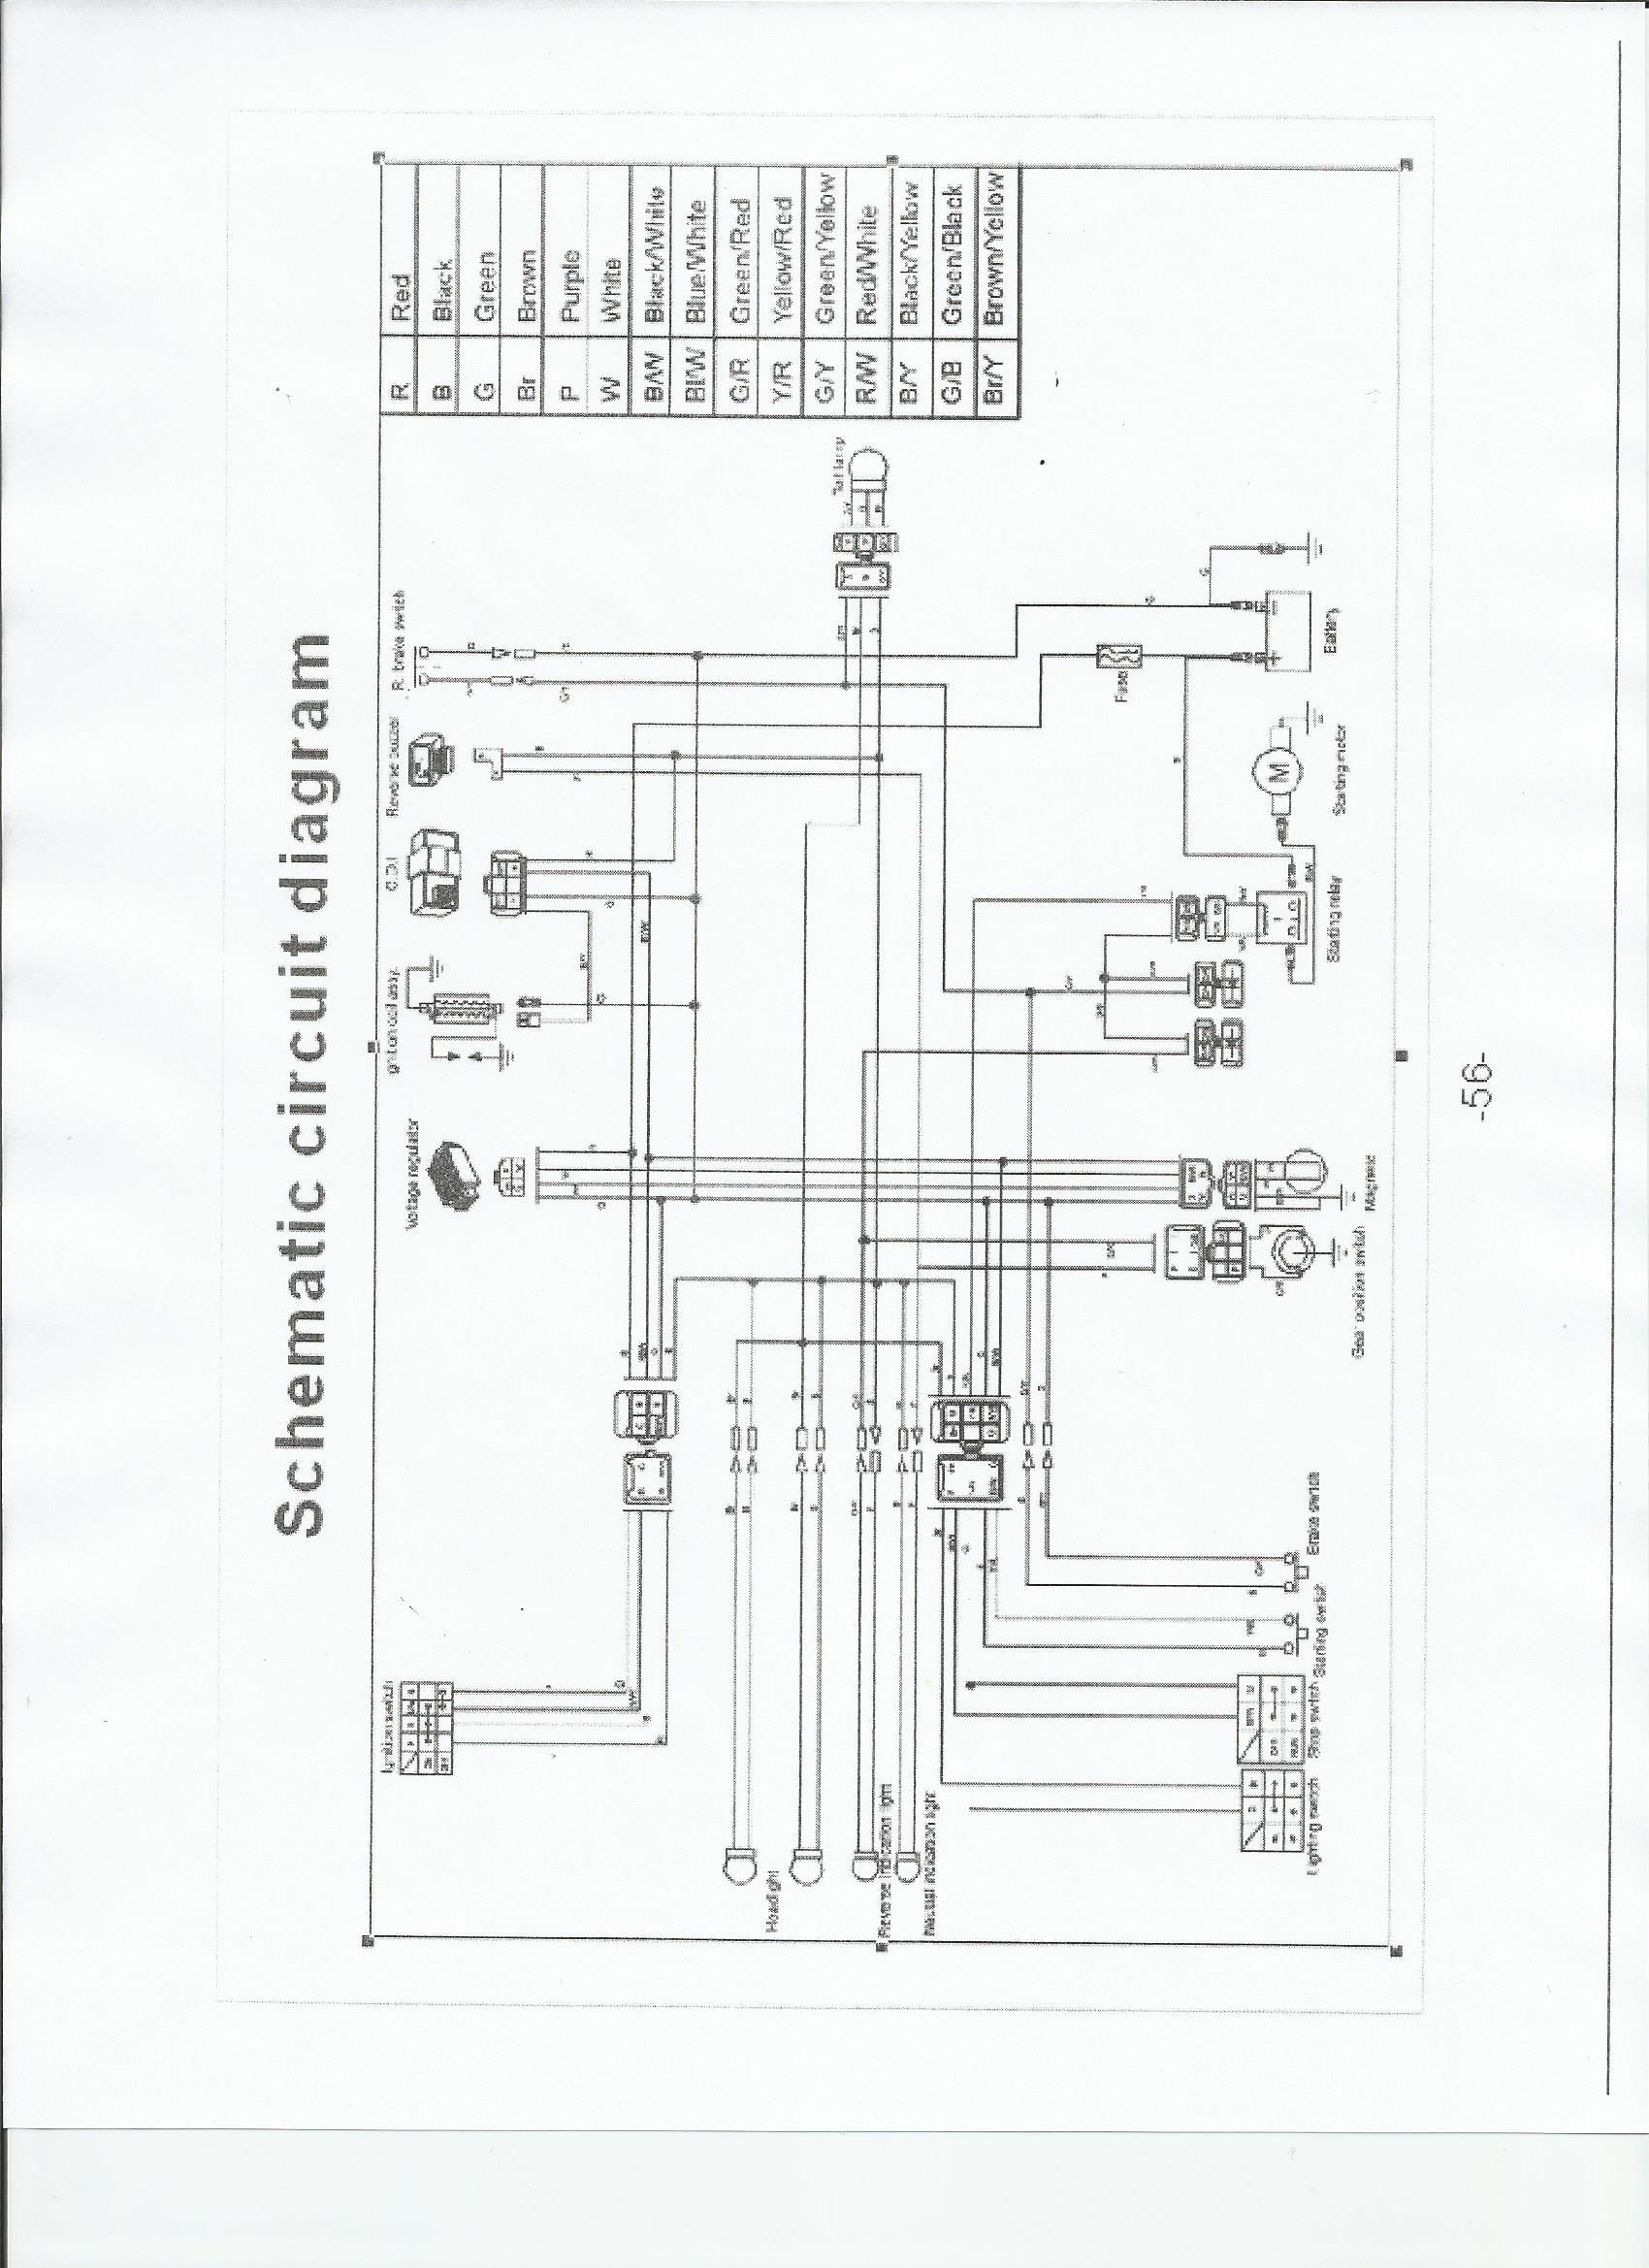 OB_2983] 49Cc Lifan Wiring Diagram Download DiagramVell Jebrp Mohammedshrine Librar Wiring 101